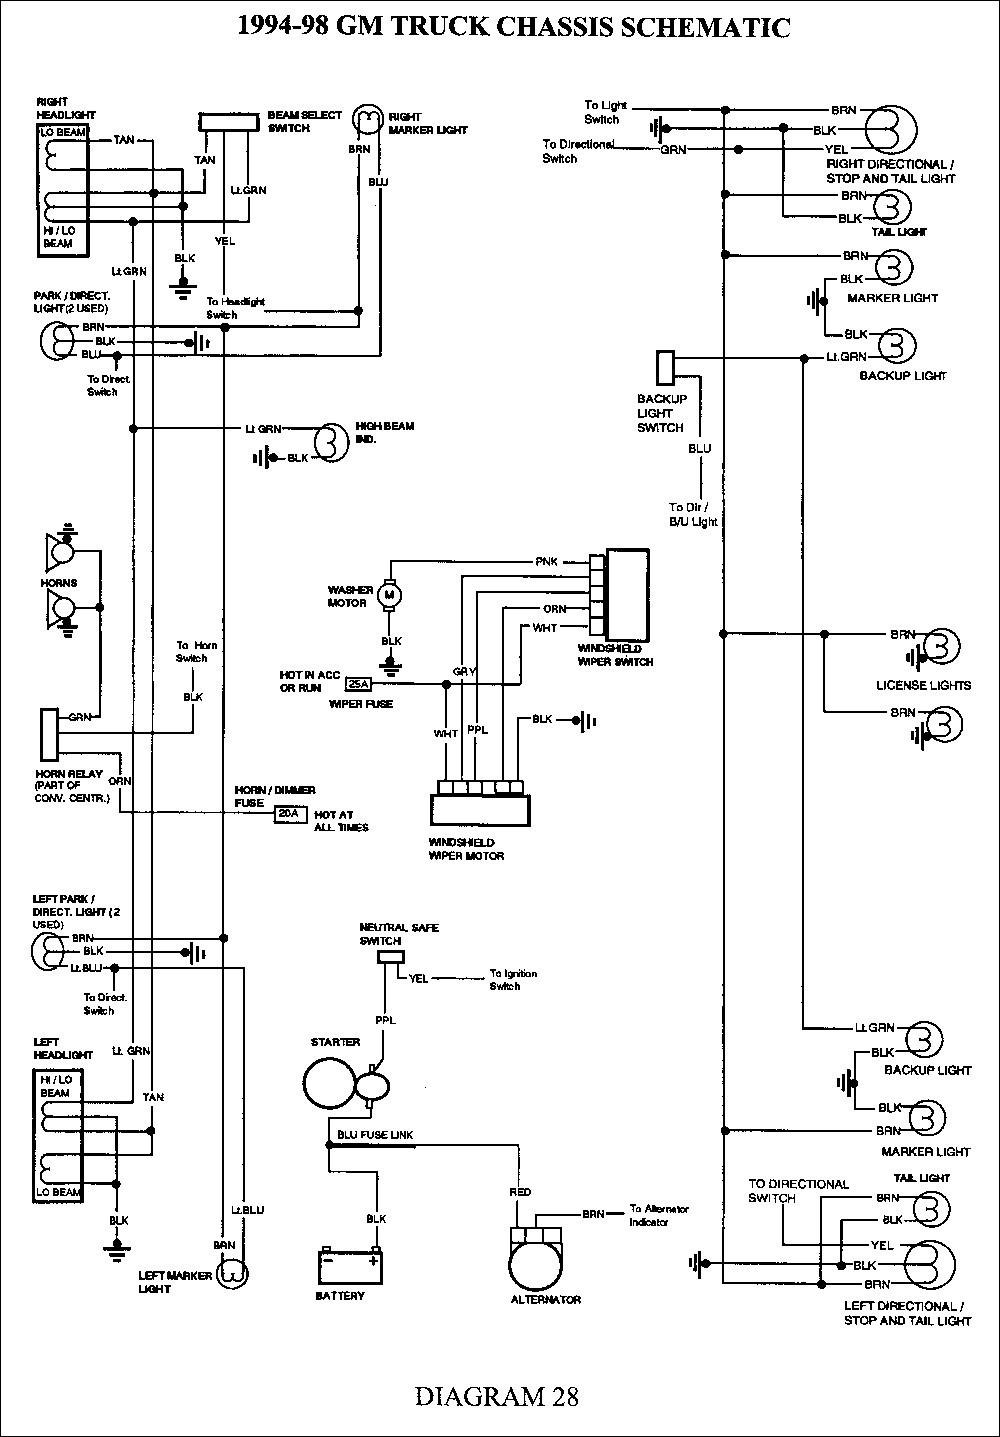 1999 Chevy Silverado Tail Light Wiring Wiring Diagram Used 1999 Vw Beetle Tail Light Wiring Diagram